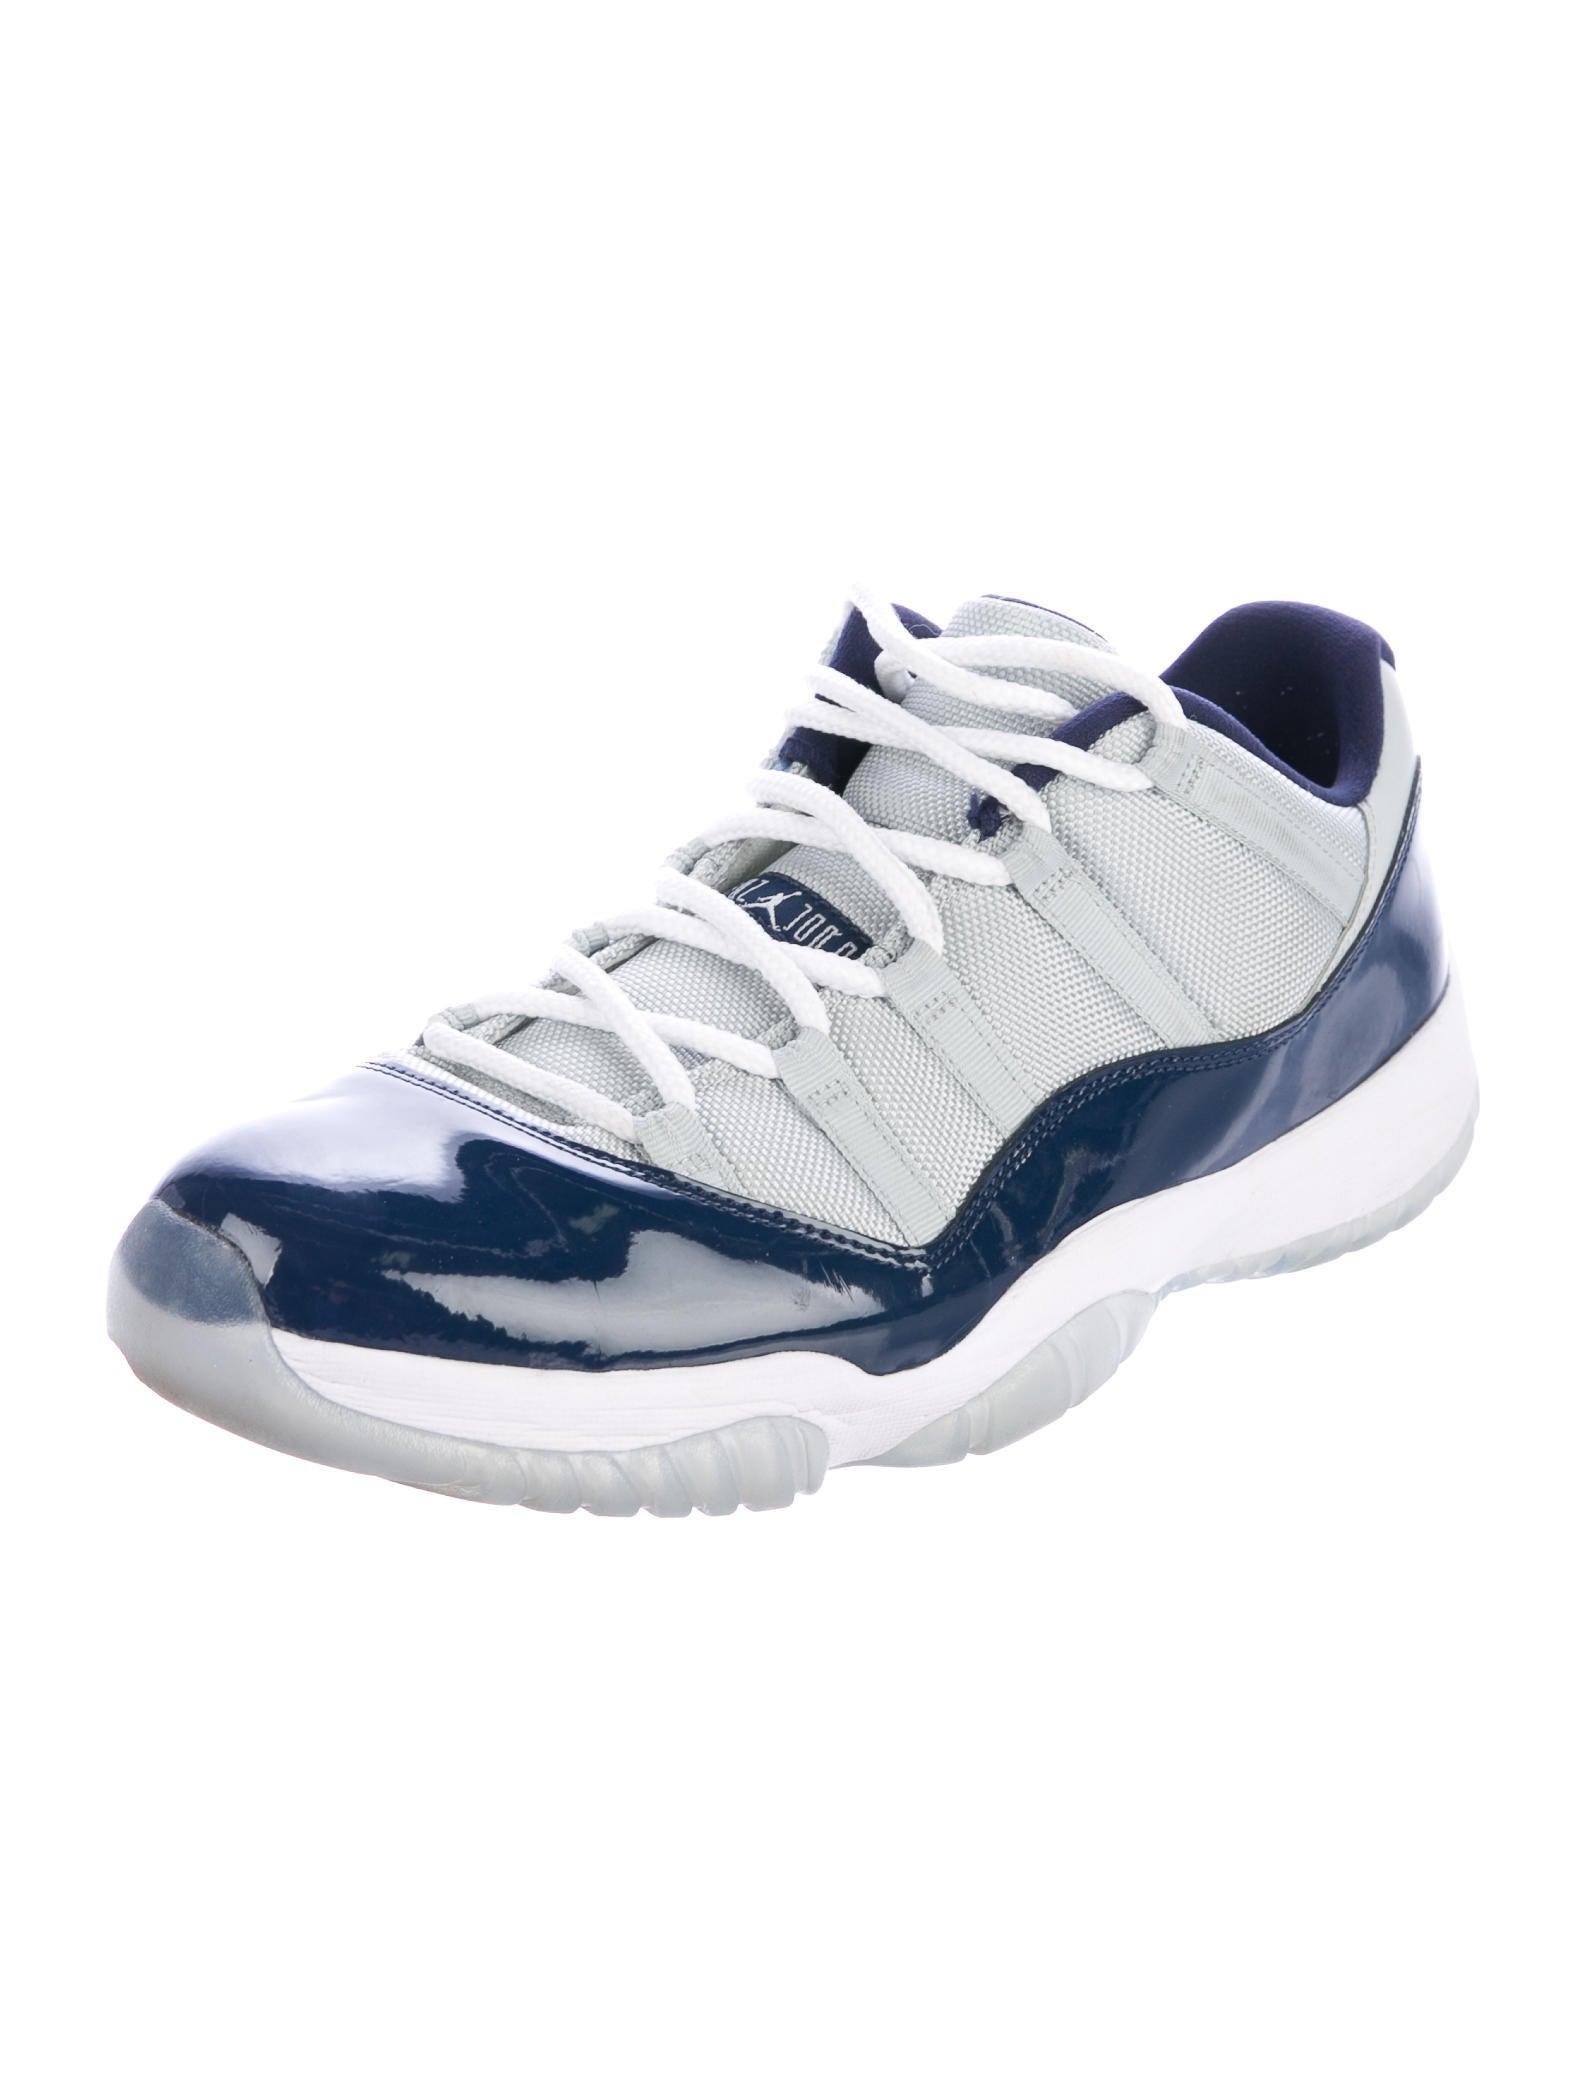 Nike Air Jordan 11 Retro Georgetown Sneakers Shoes